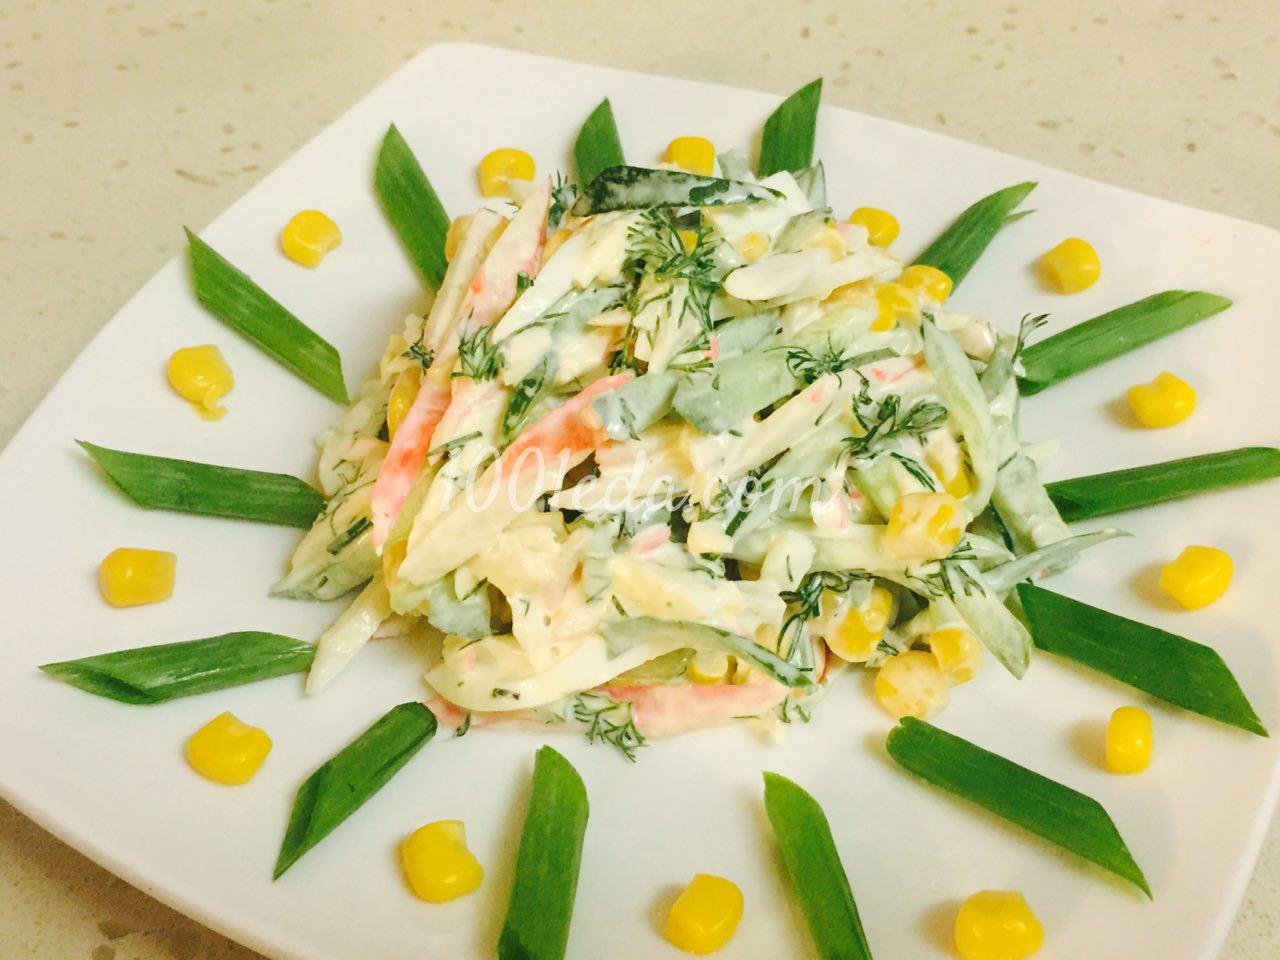 Салат с крабовыми палочками и со свежим огурцом